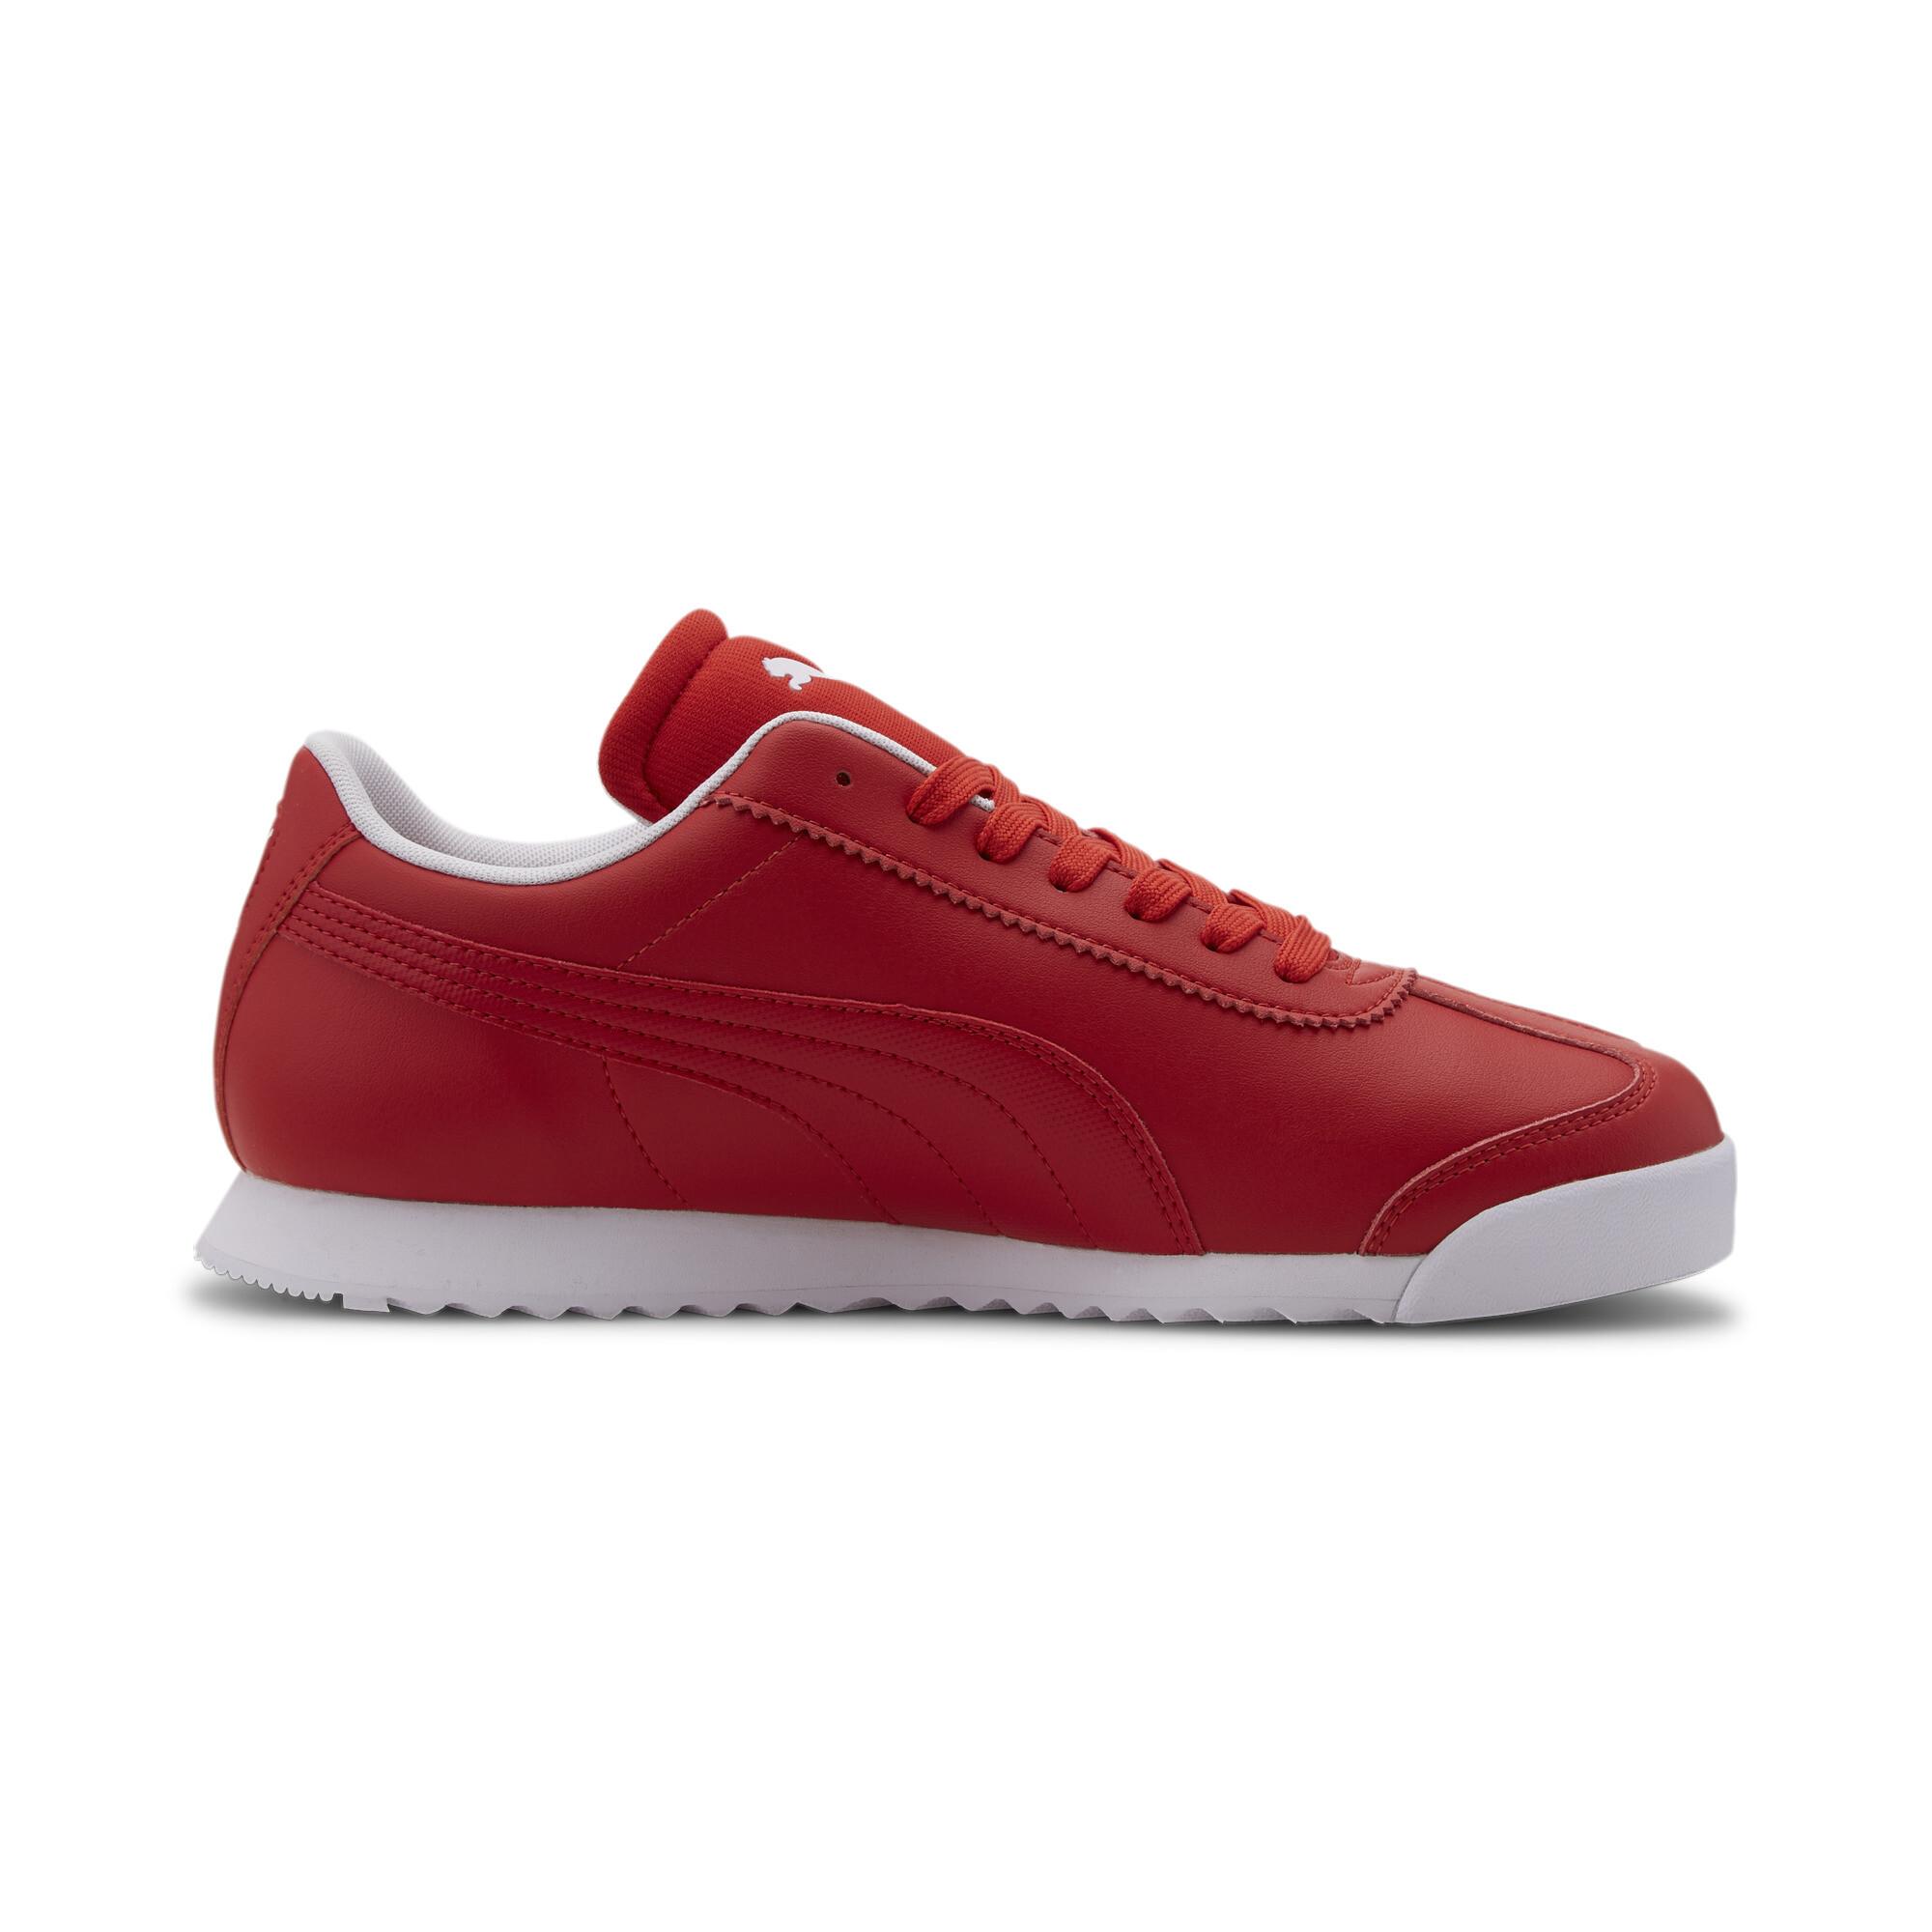 PUMA-Men-039-s-Scuderia-Ferrari-Roma-Sneakers thumbnail 22